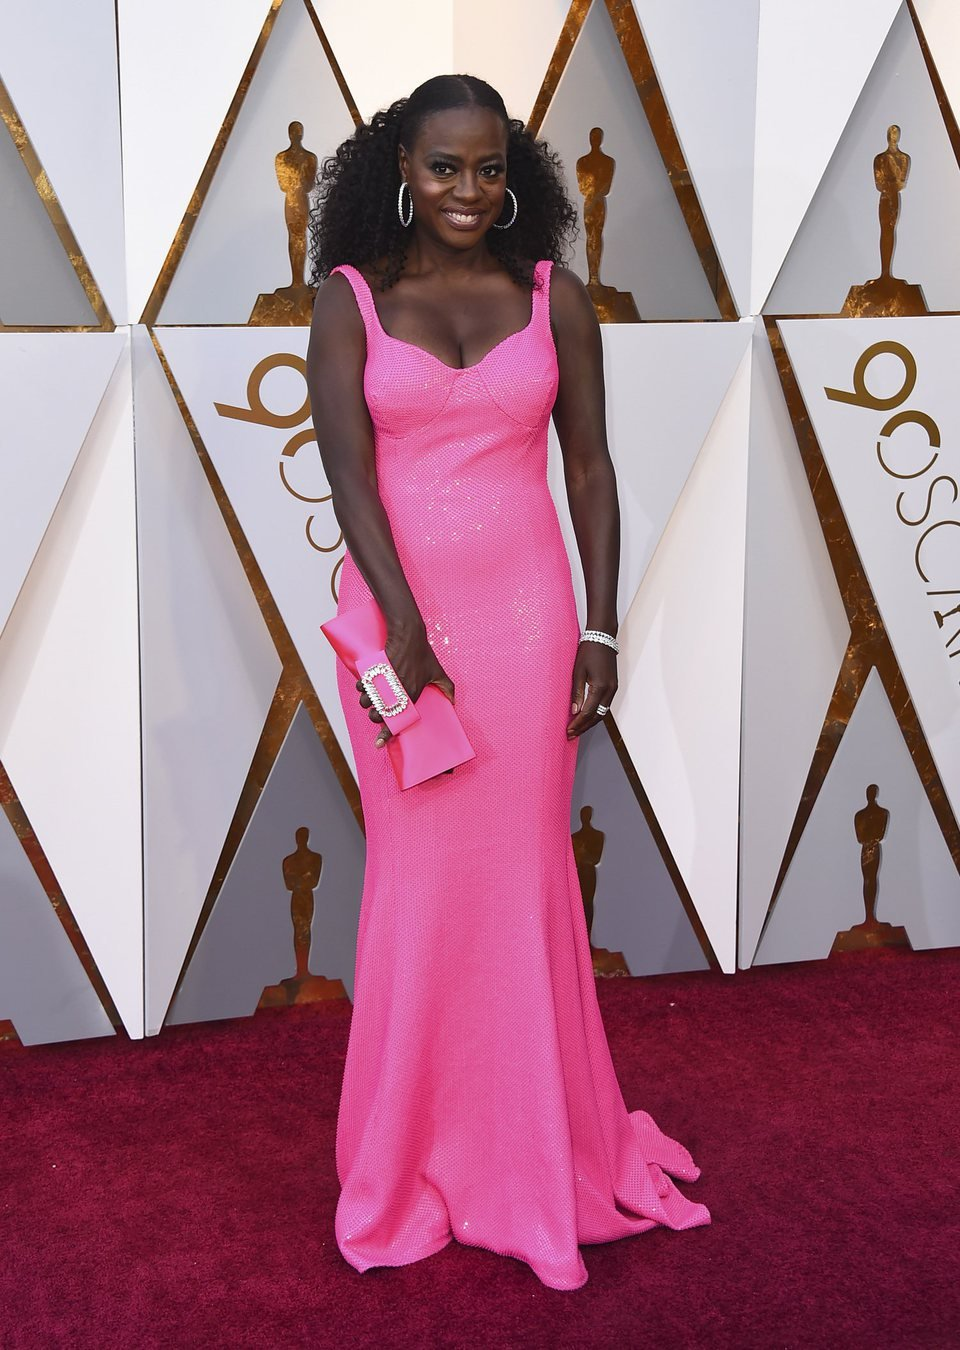 Viola Davis at the Oscars 2018 red carpet